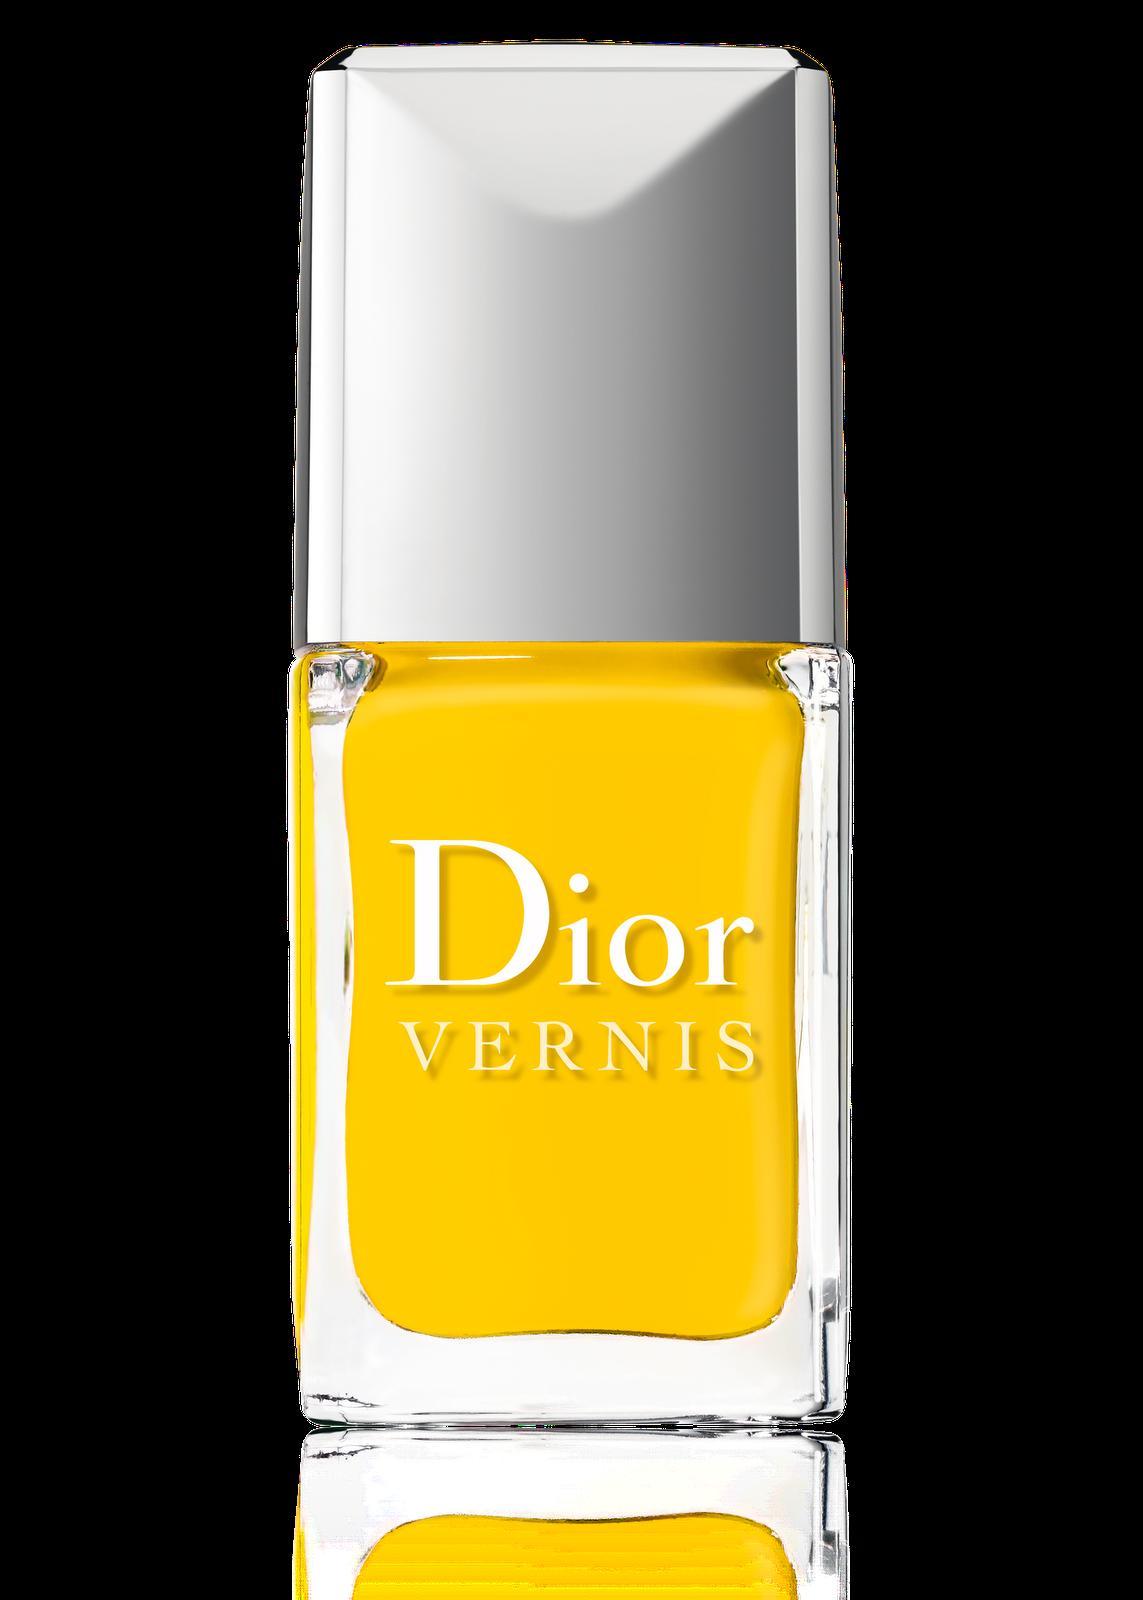 Dior Vernis Nagellack 10ml. GROßE FARBAUSWAHL   eBay